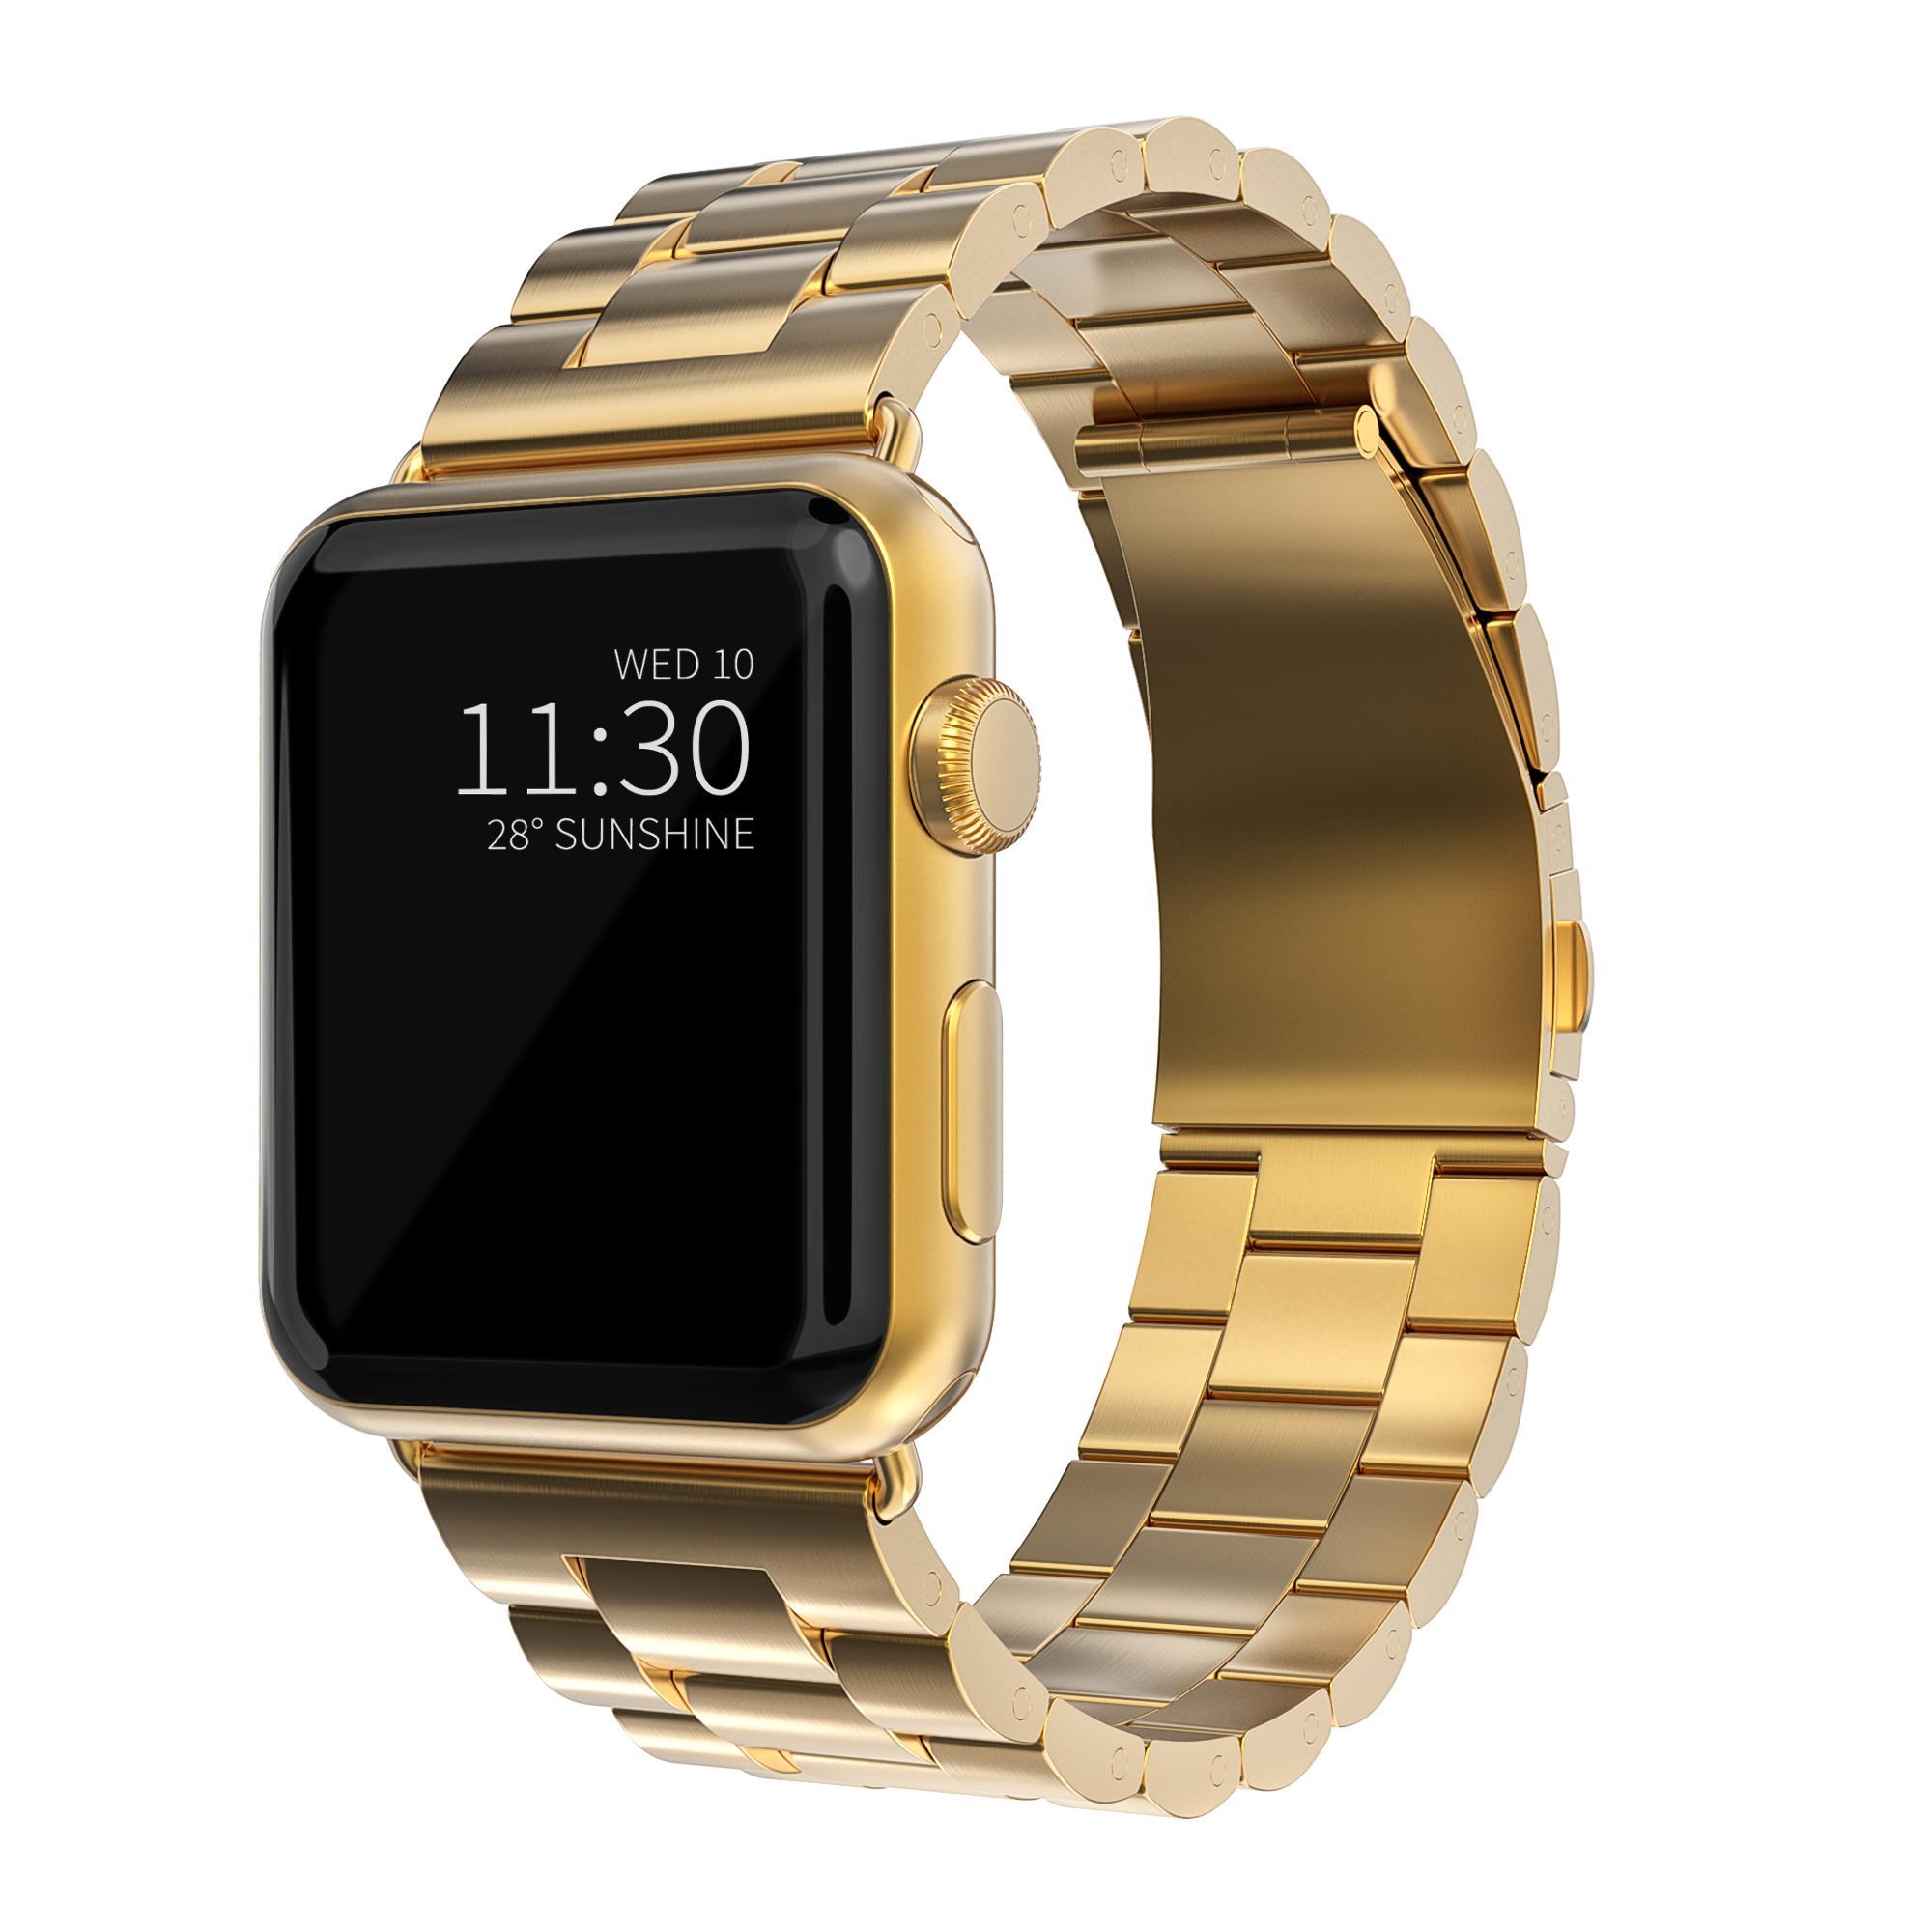 Metallarmband Apple Watch 42/44 mm guld